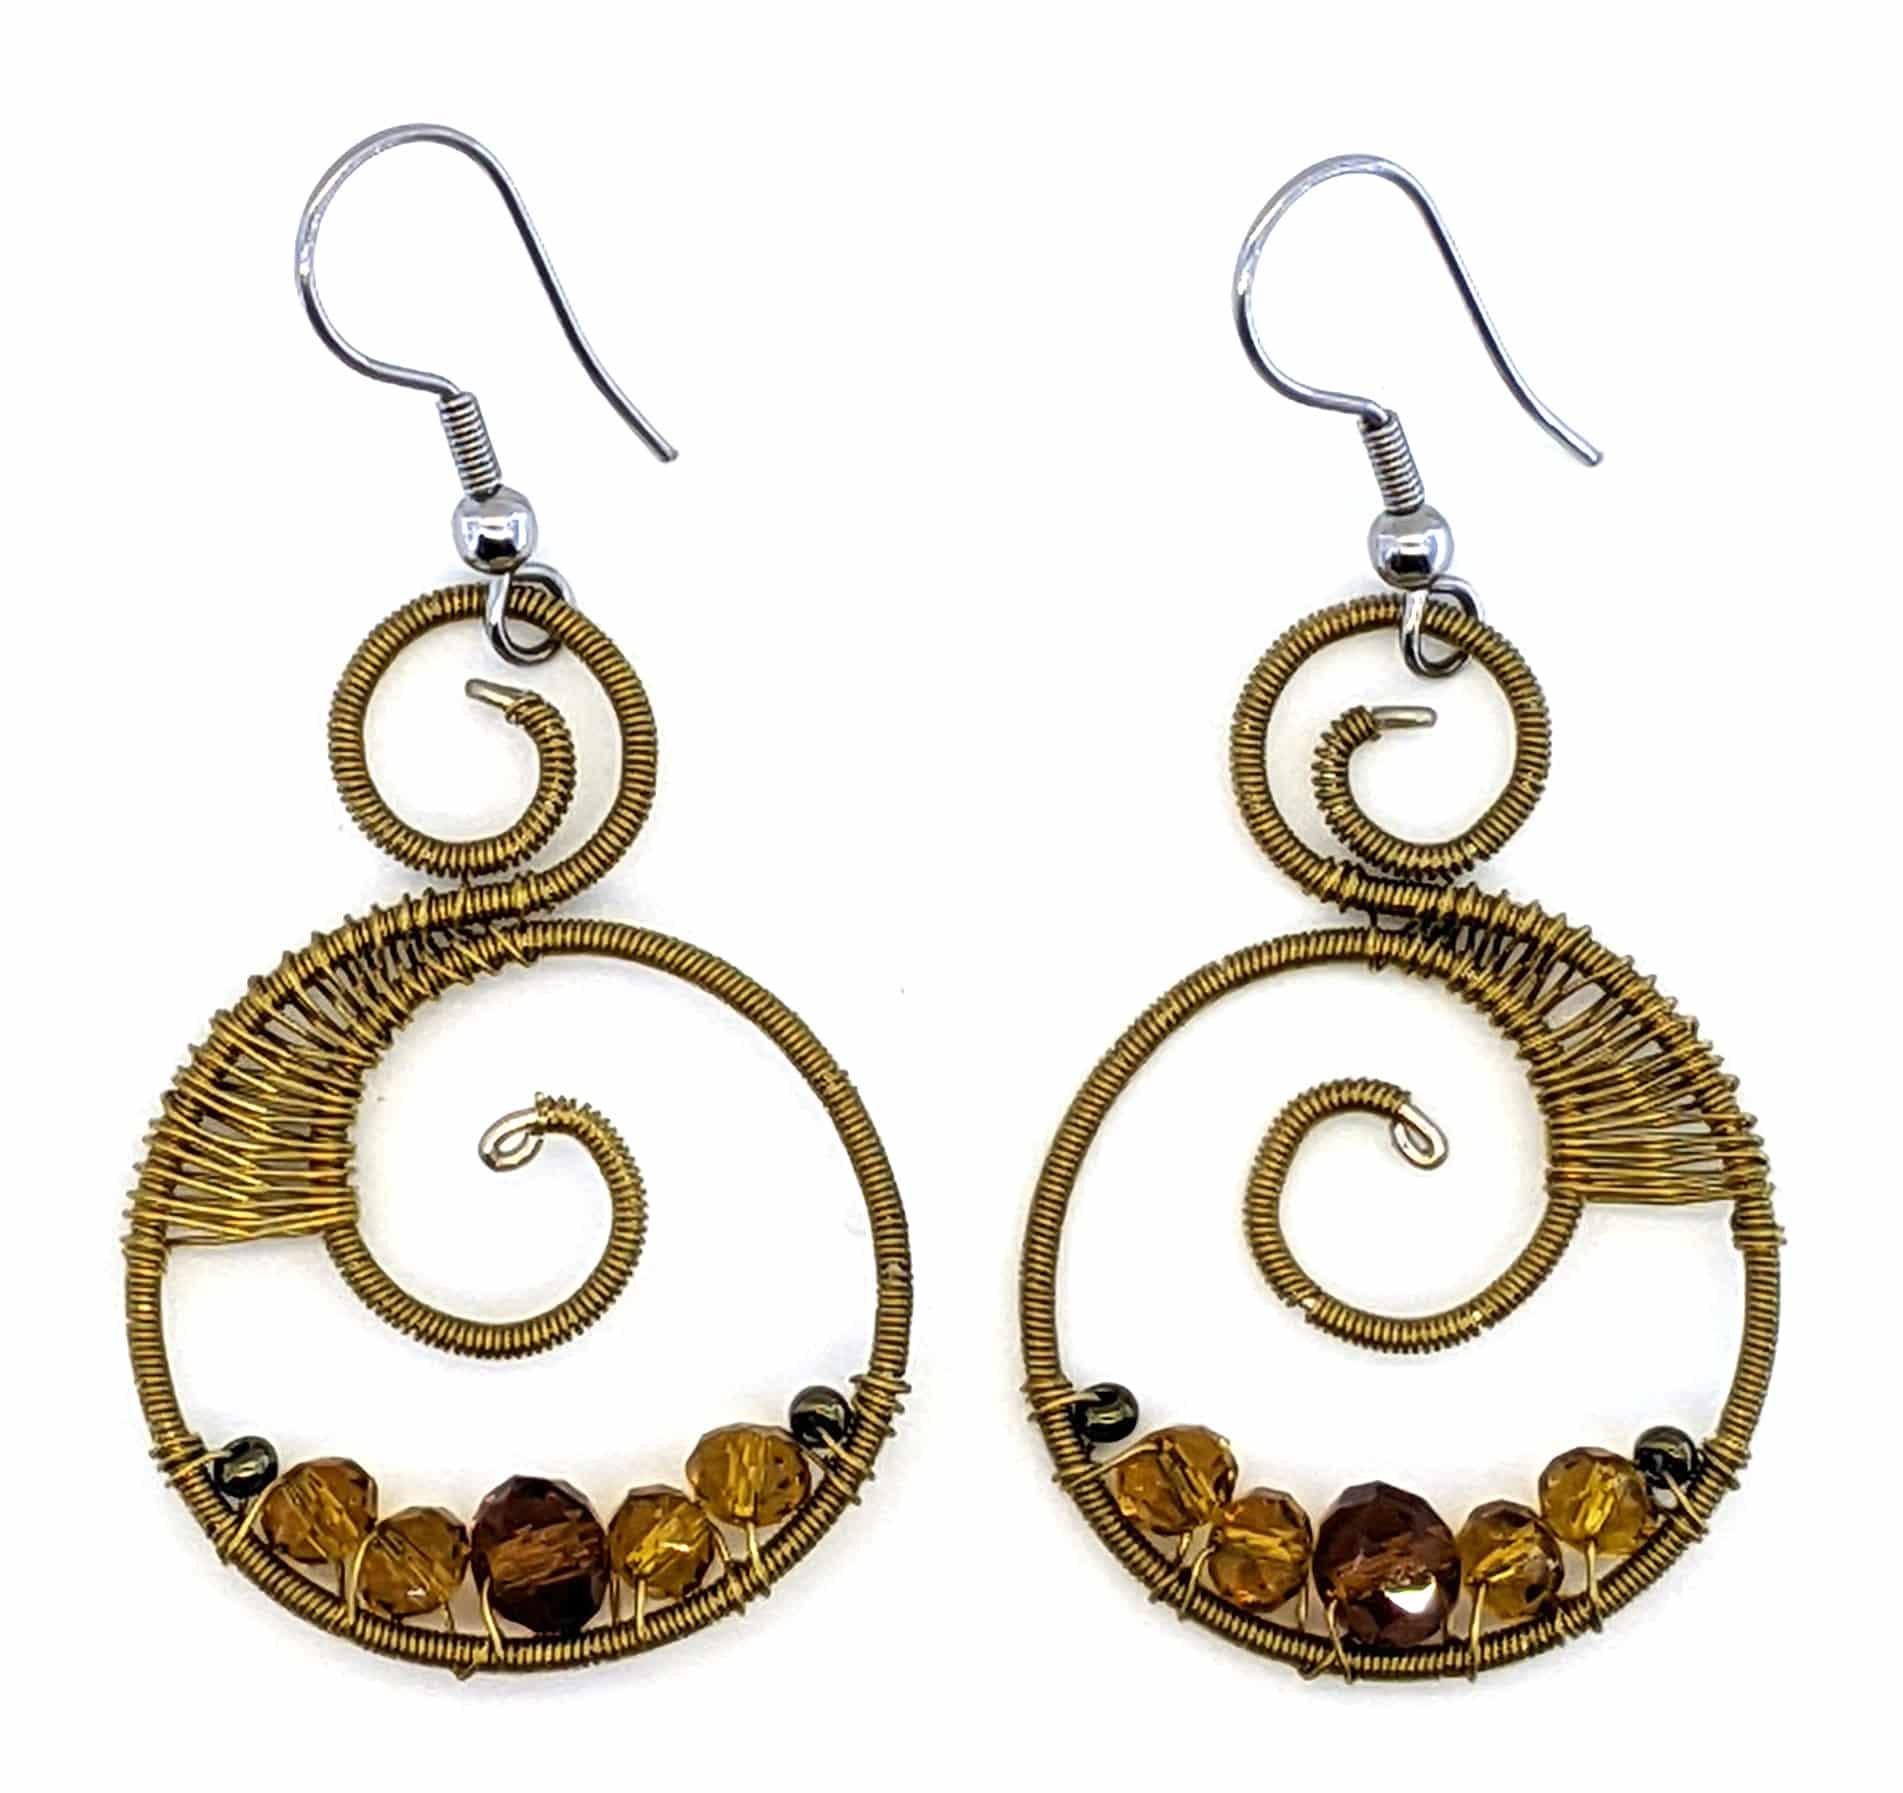 Curly Beaded Earrings - Golds